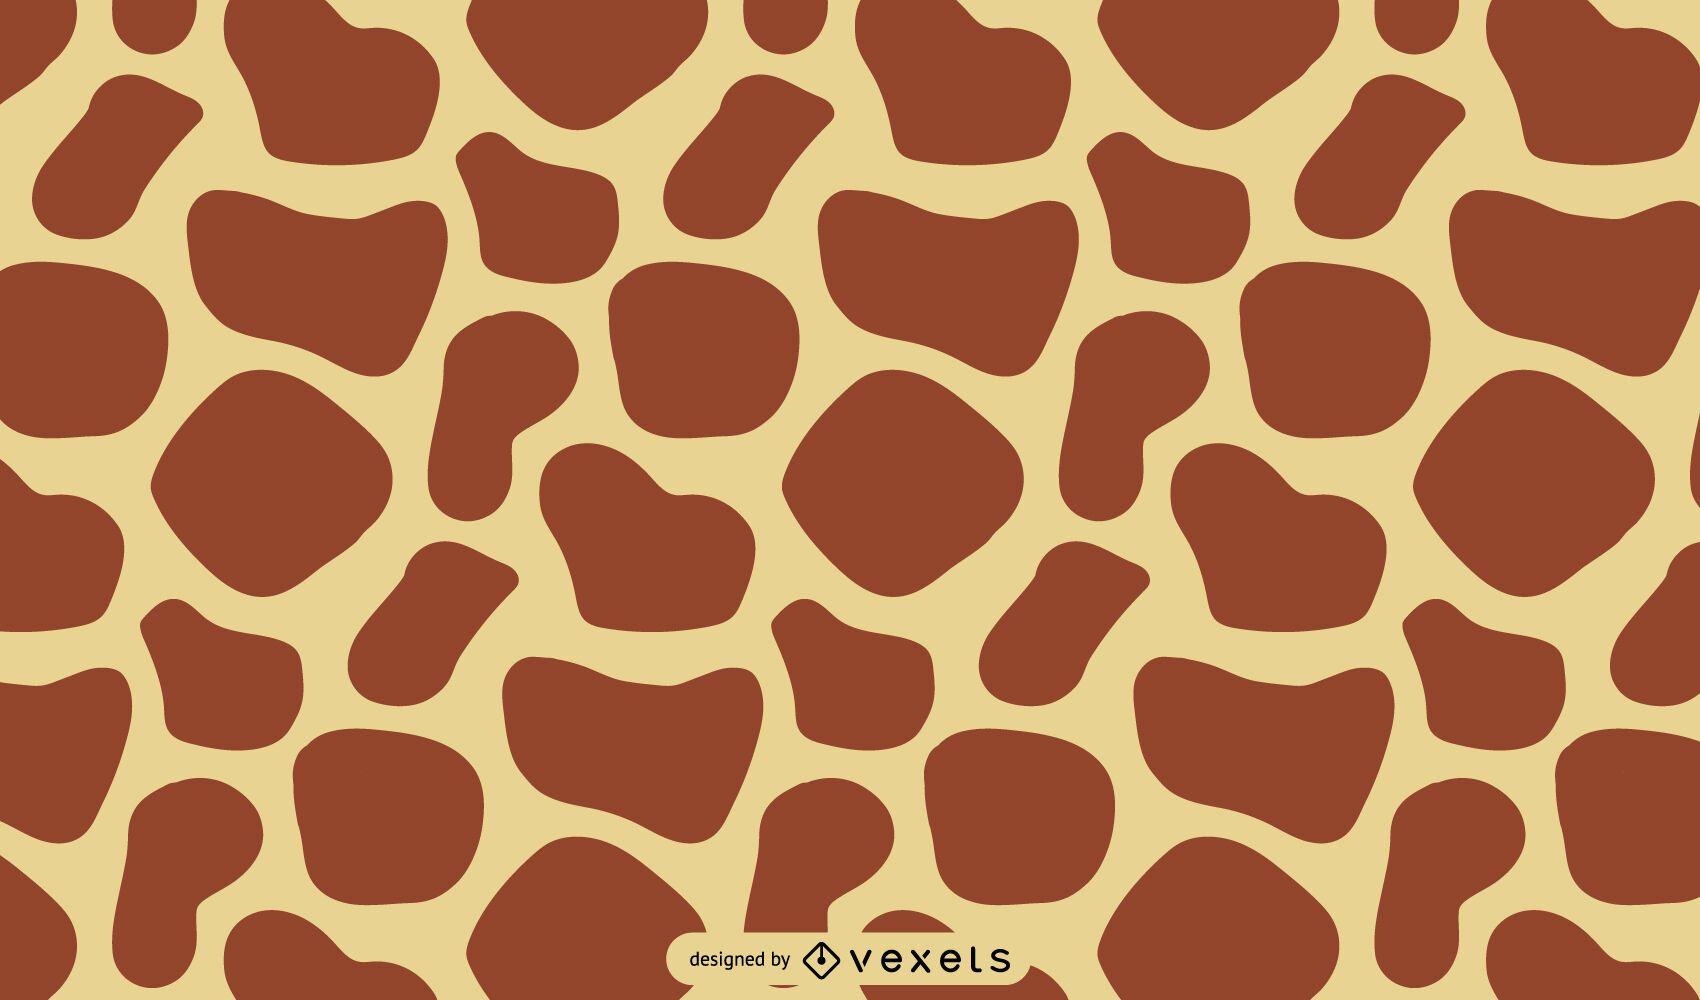 Desenho de estampa de girafa